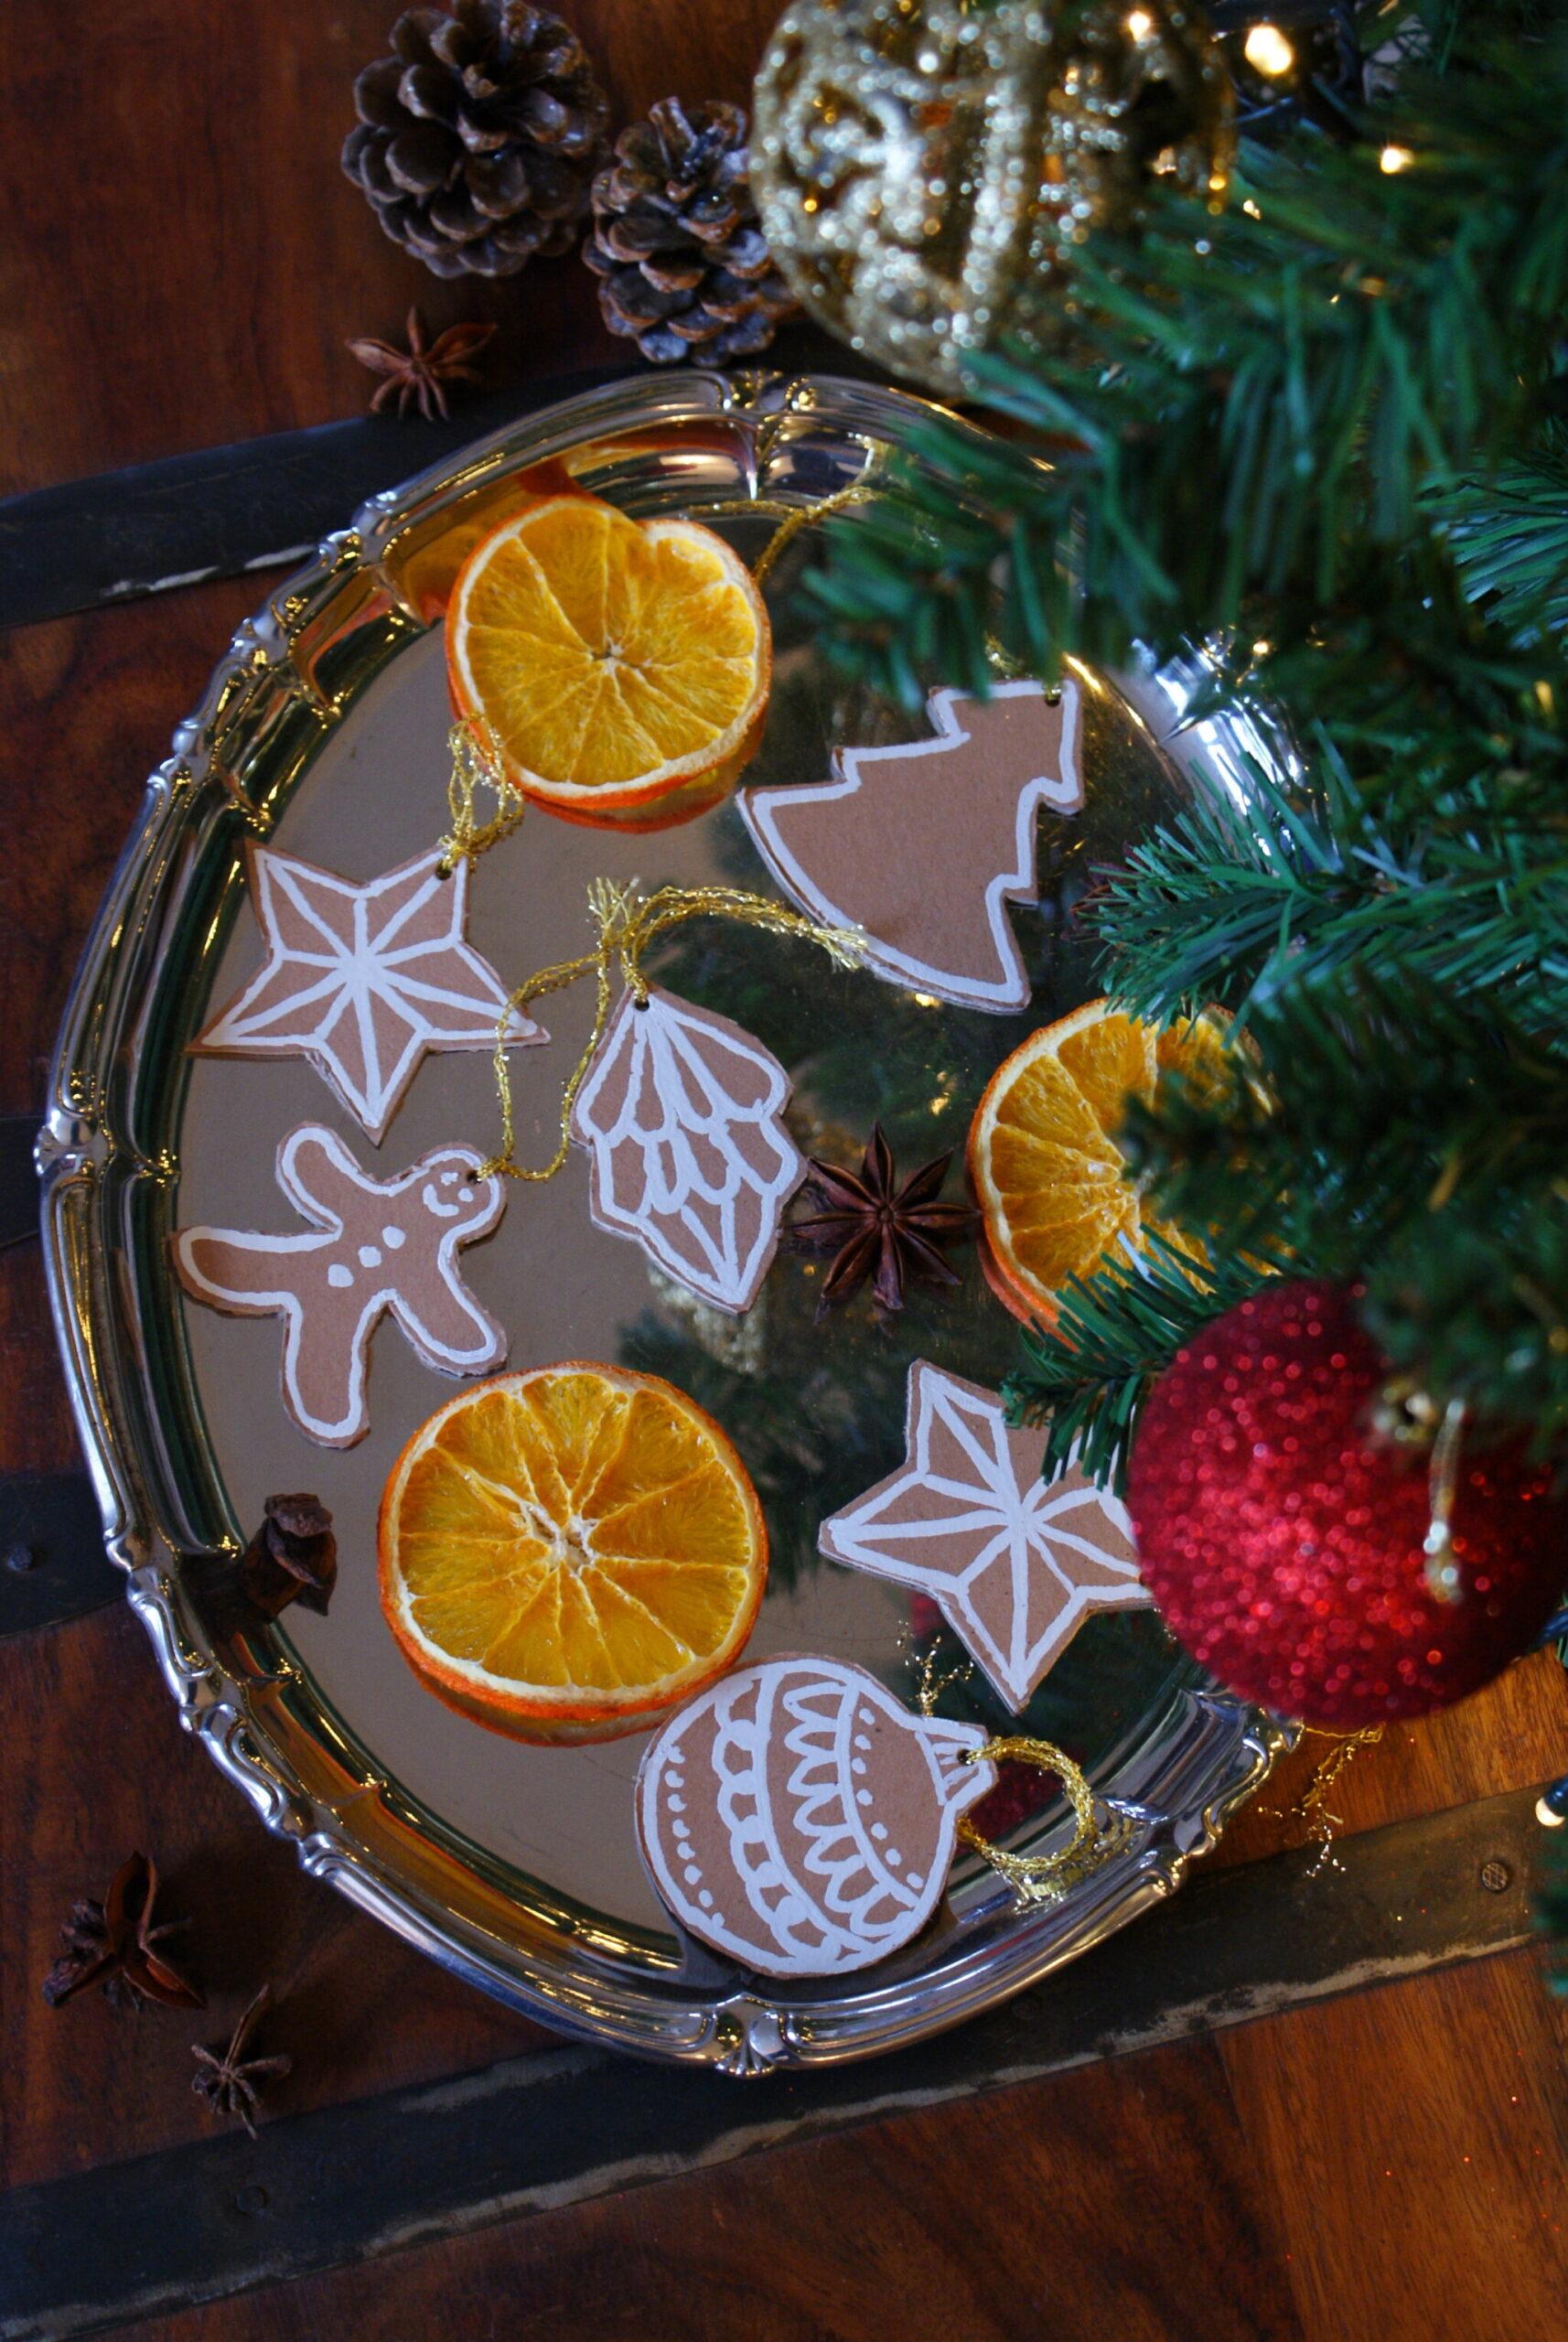 diy cardboard gingerbread cookies christmas tree ornaments idea easy last minute francinesplaceblog